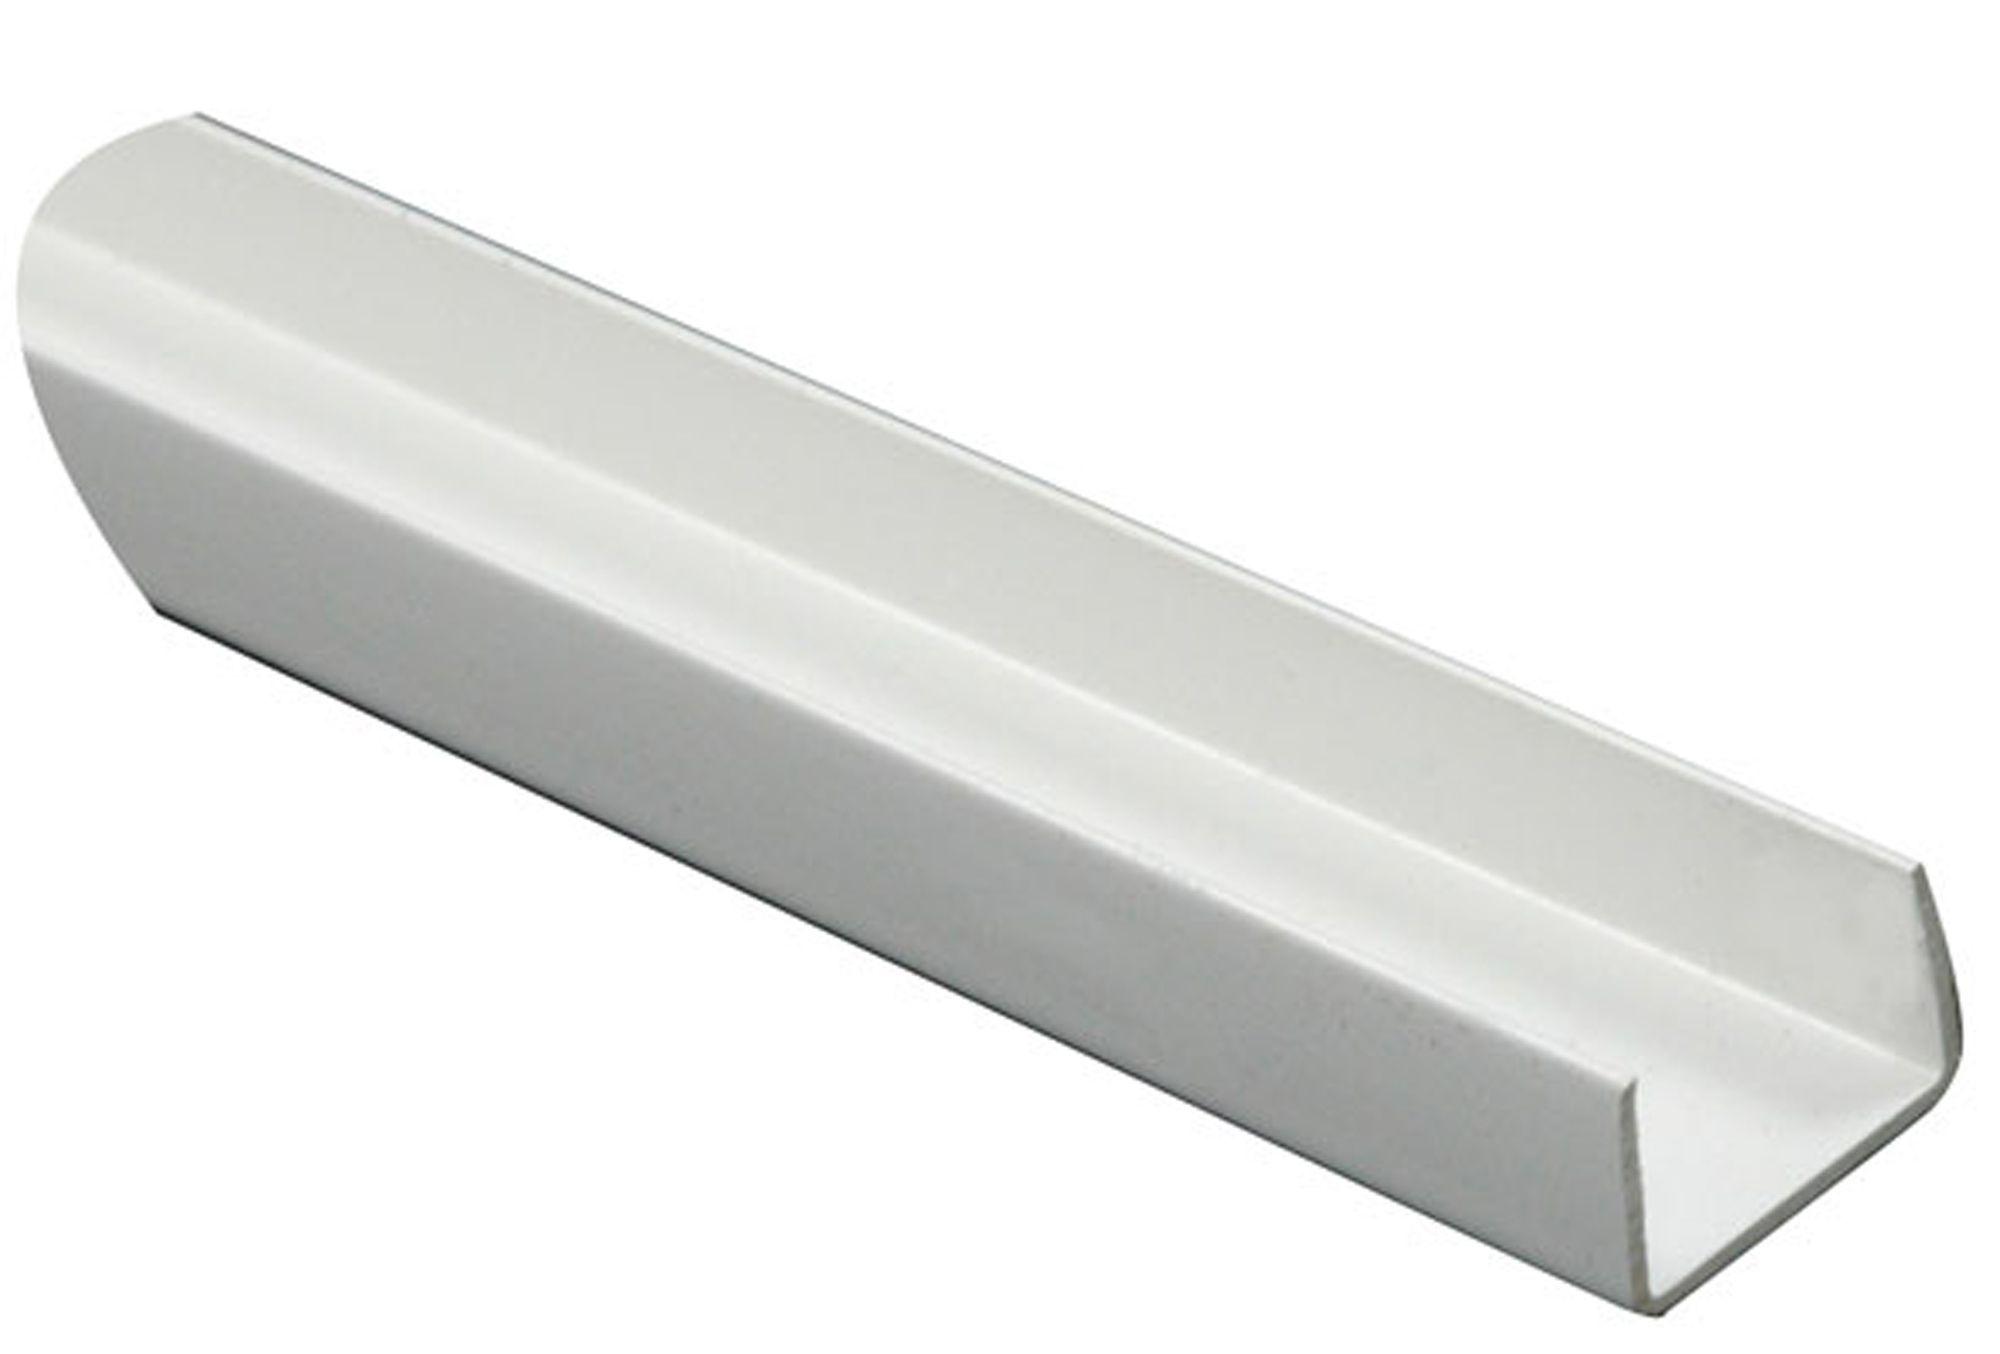 Extrem White PVC U profile (H)10mm (W)18mm (L)2m | Departments | DIY NA12